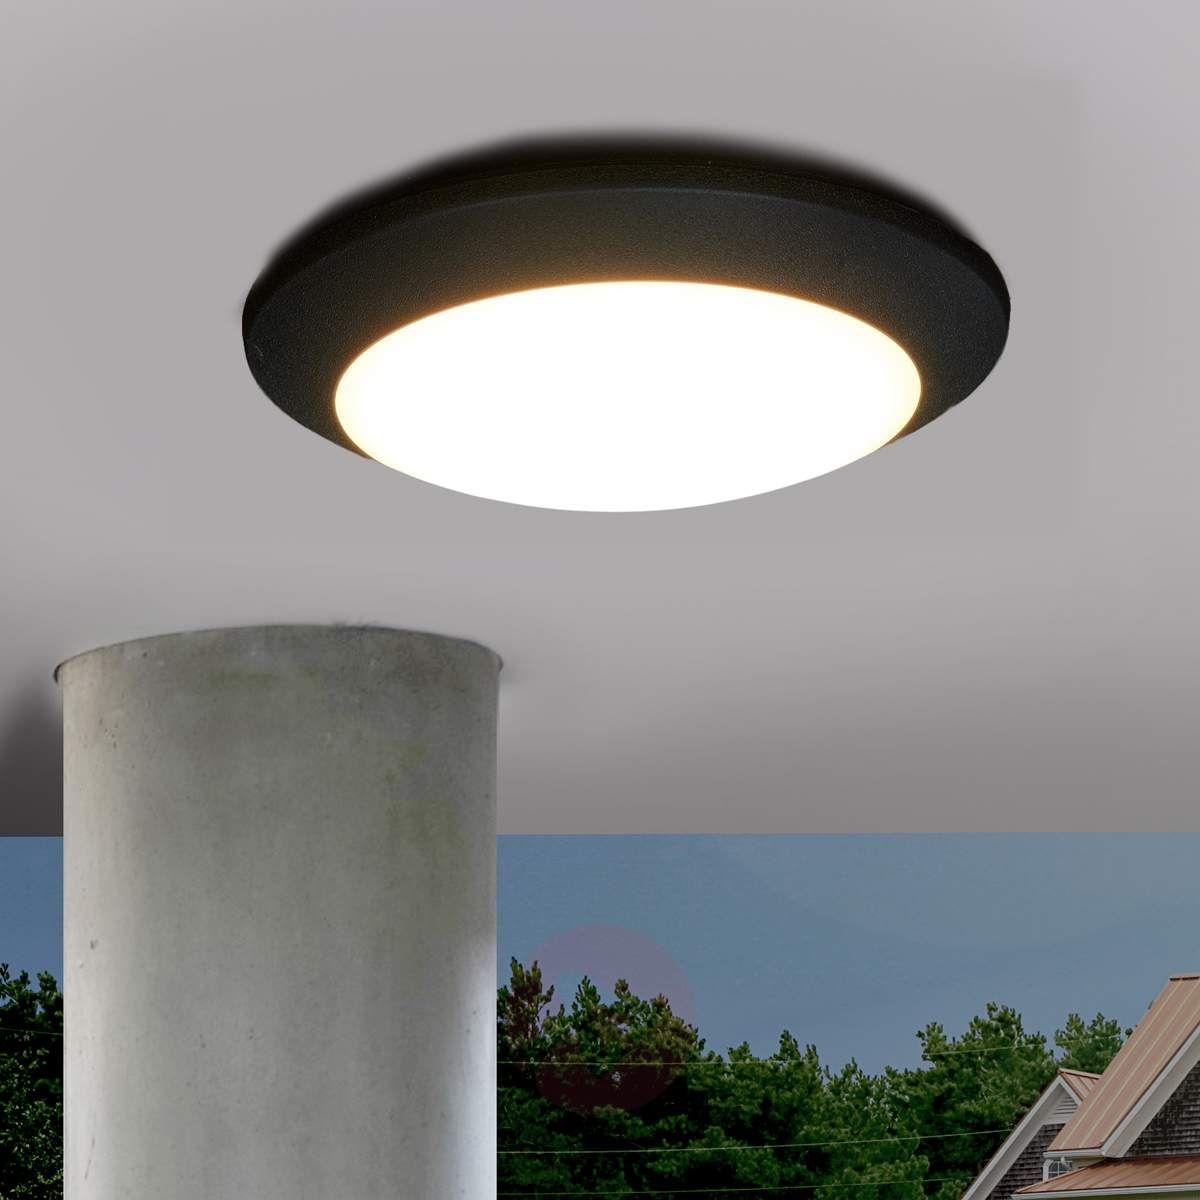 Zewnętrzna Lampa Sufitowa Led Berta Czarna Lampy Sufitowe